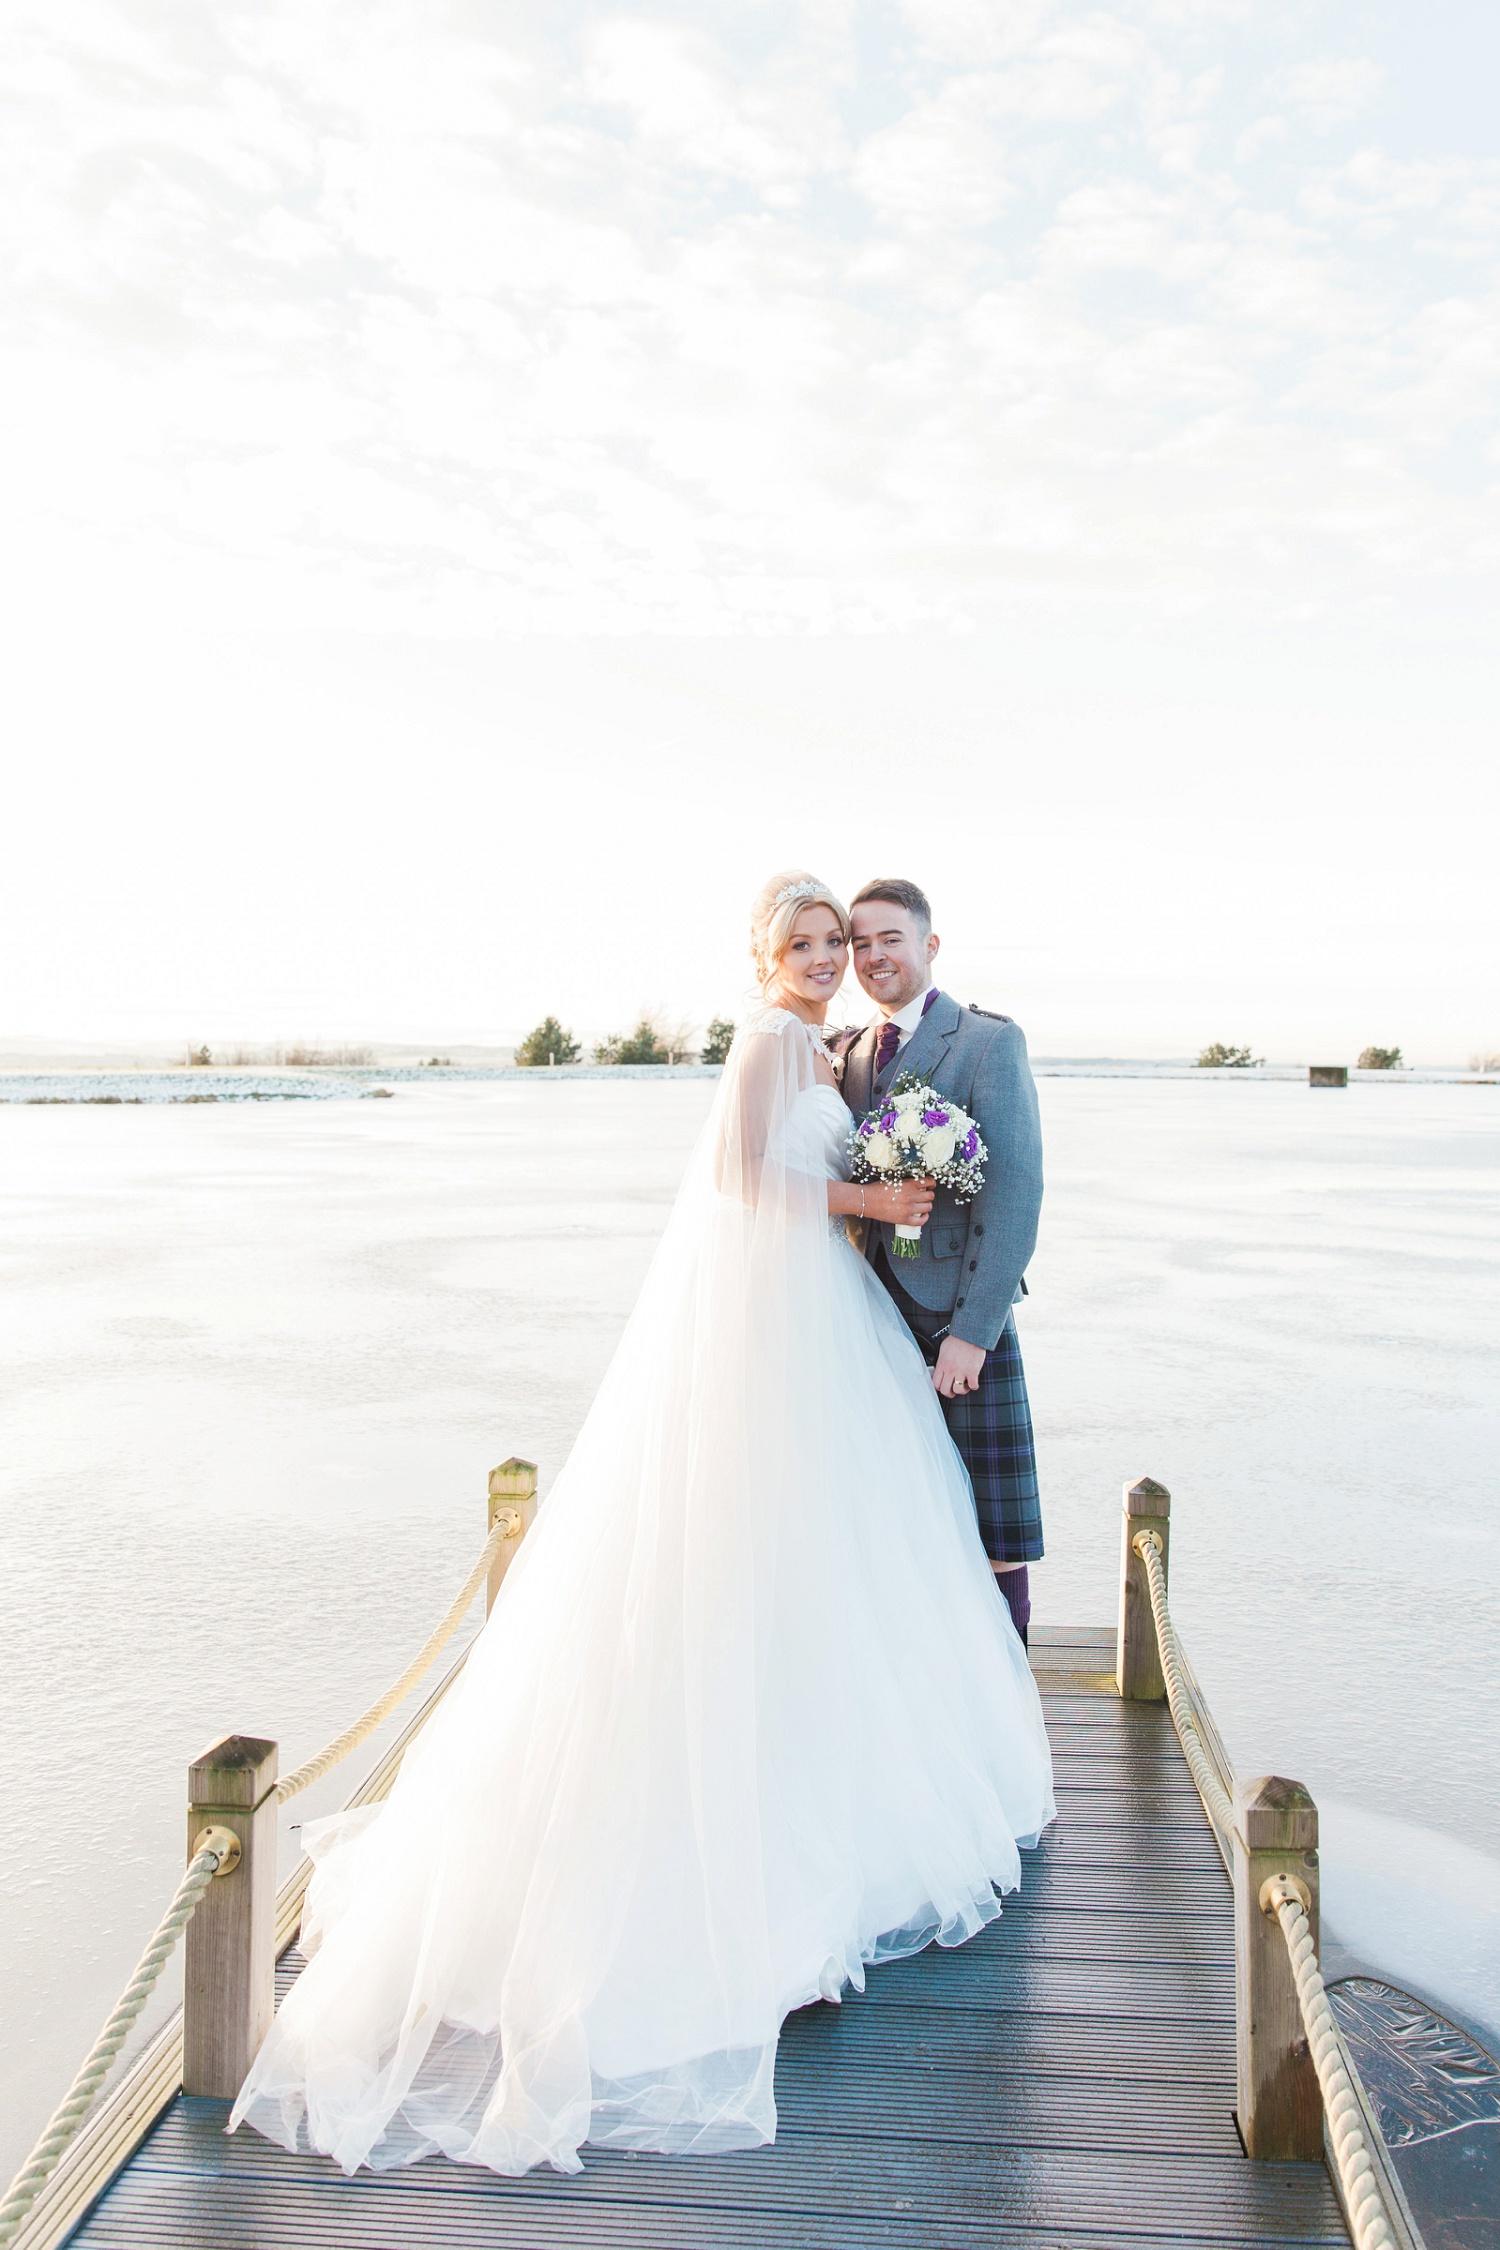 Scotland wedding photographer testimonial